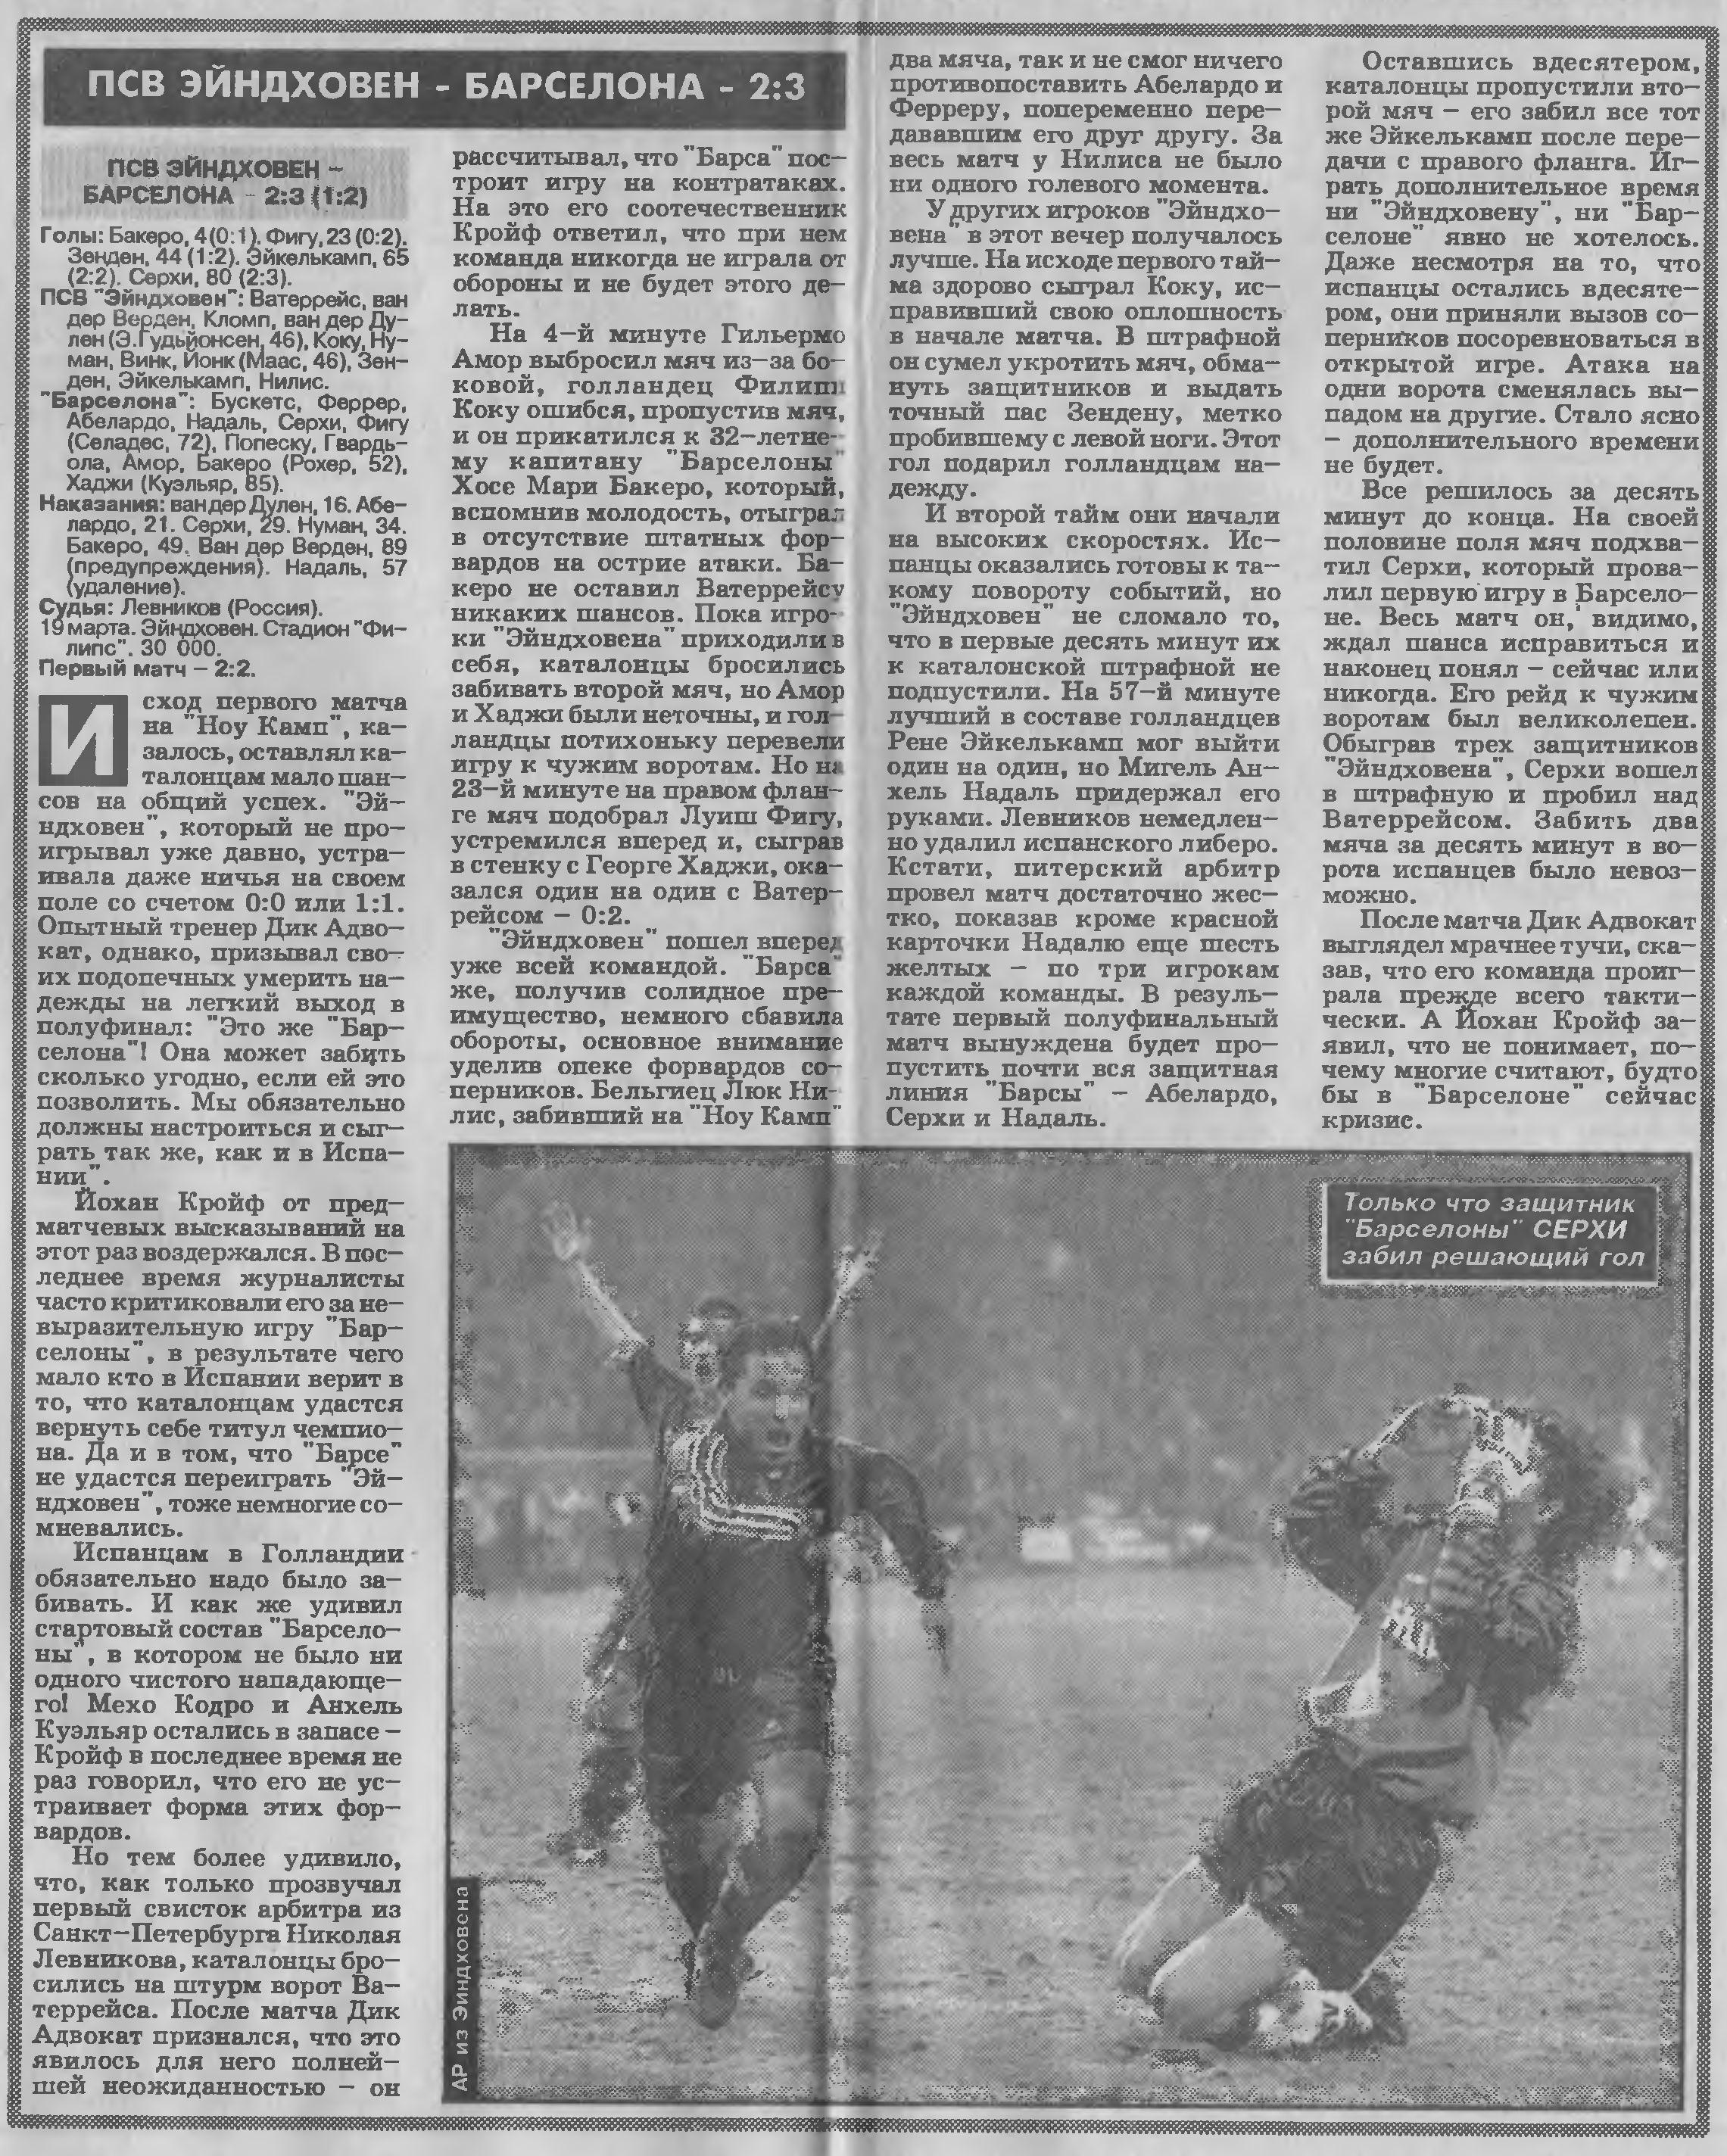 ПСВ (Голландия) - Барселона (Испания) 2:3